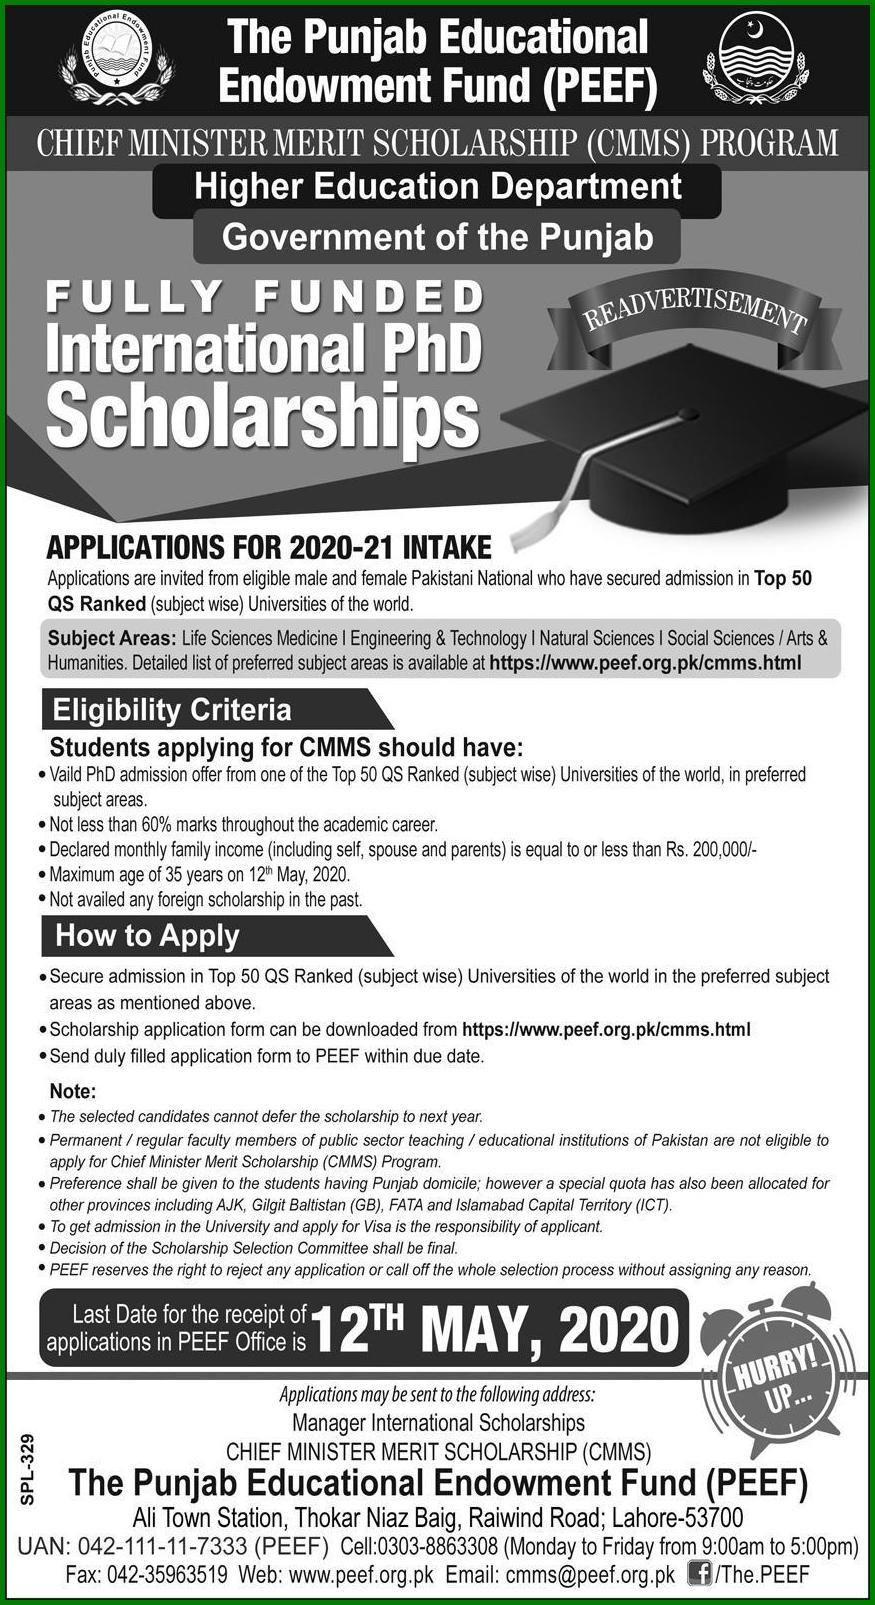 Peef Chief Minister Merit Scholarship Cmms Programs 2020 In 2020 Scholarships Scholarships Application Top Universities